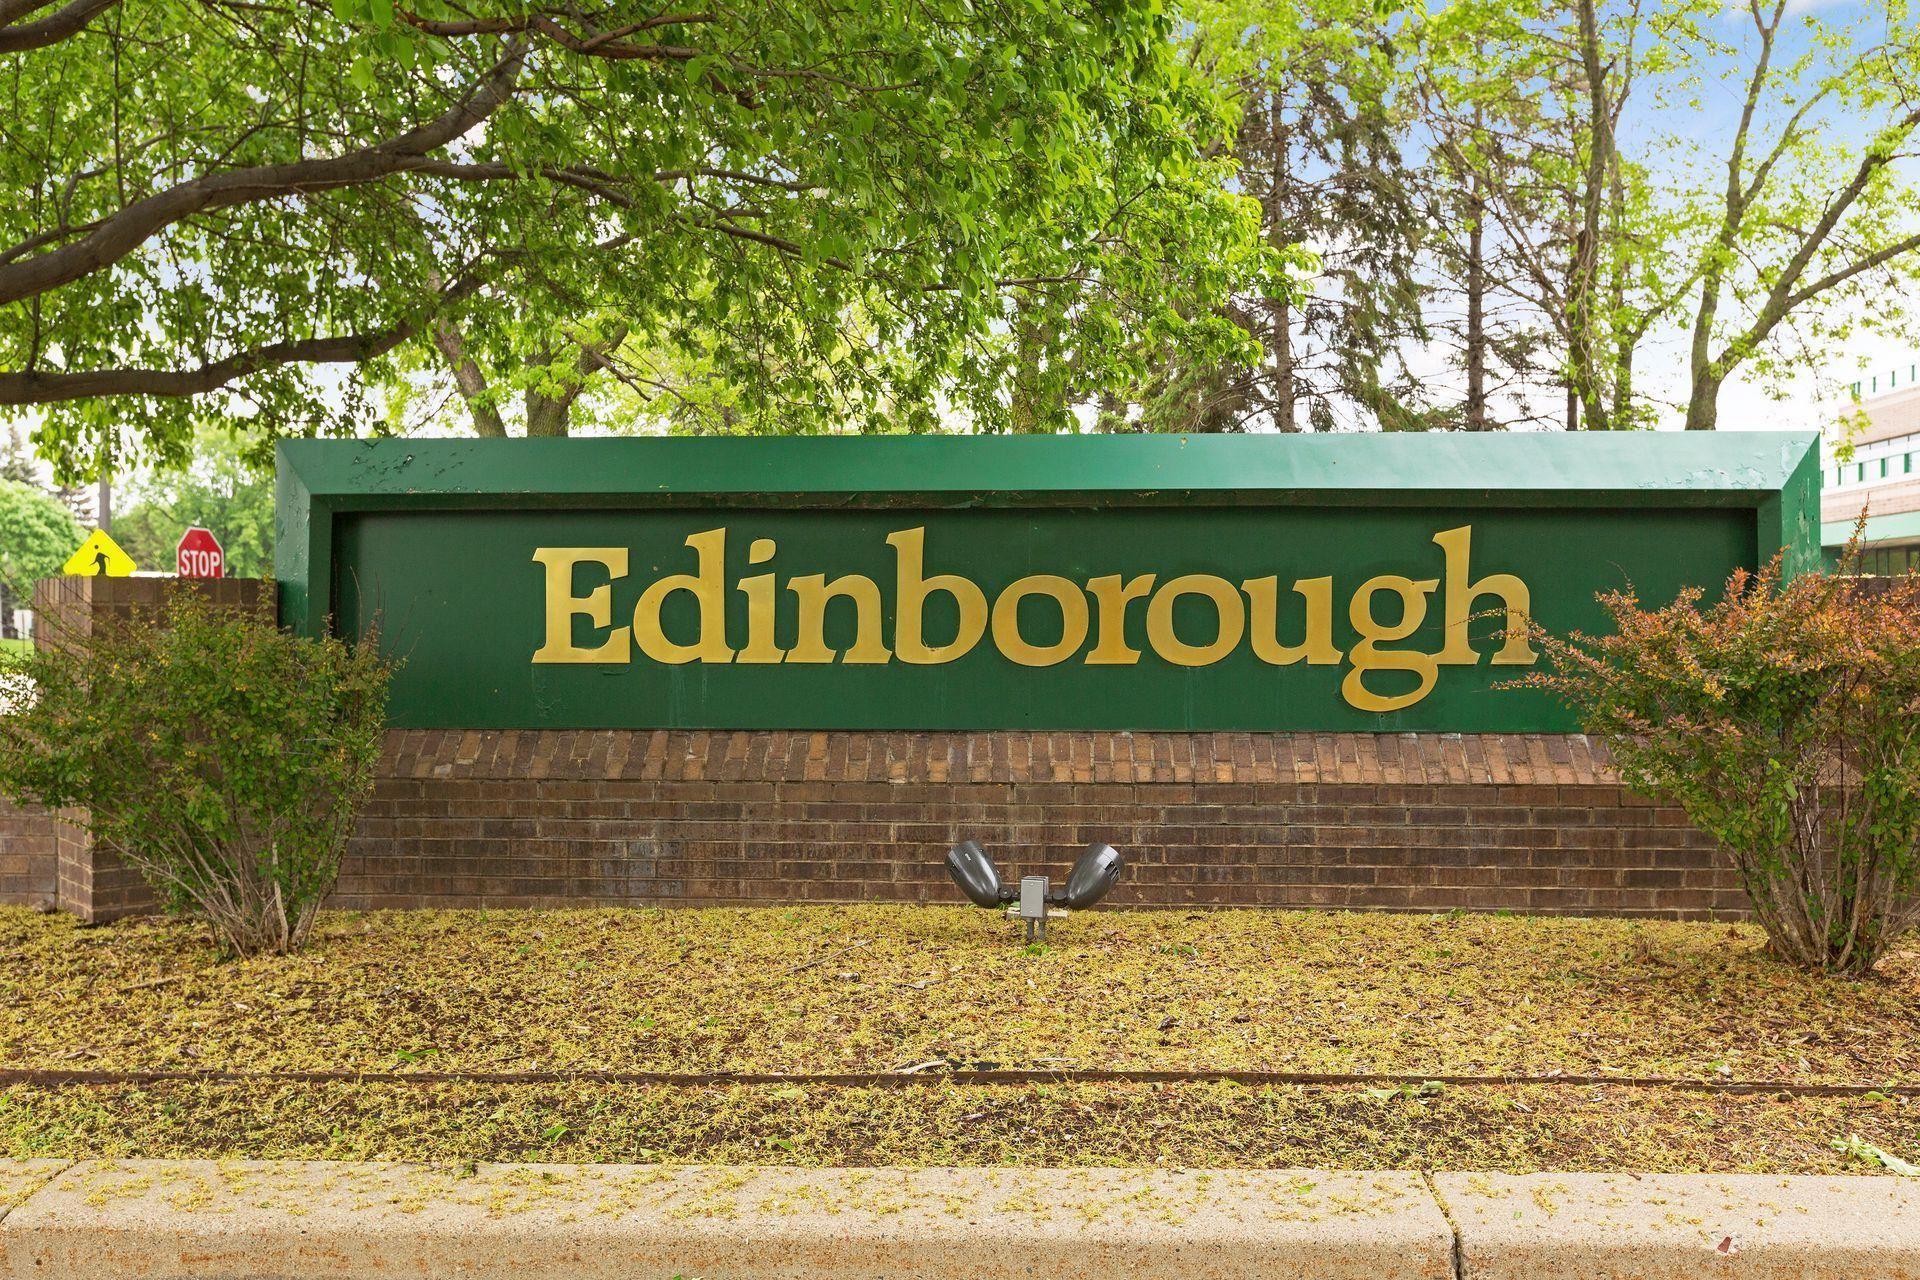 Photo of 7615 Edinborough Way #4205, Edina, MN 55435 (MLS # 6100618)